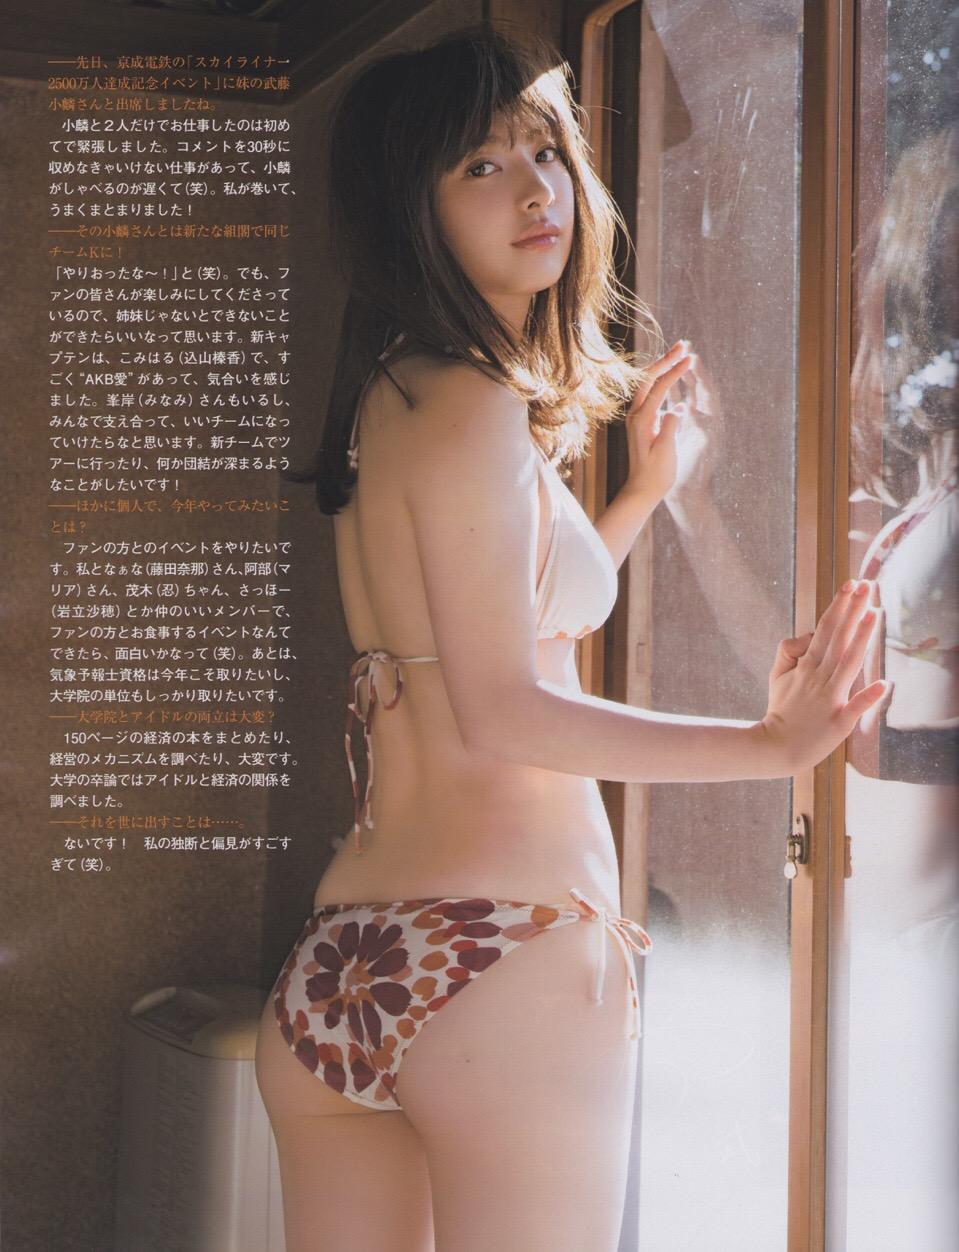 Muto Tomu 武藤十夢 AKB48, Ex-Taishu 2017.02 (EX大衆 2017年02月号)